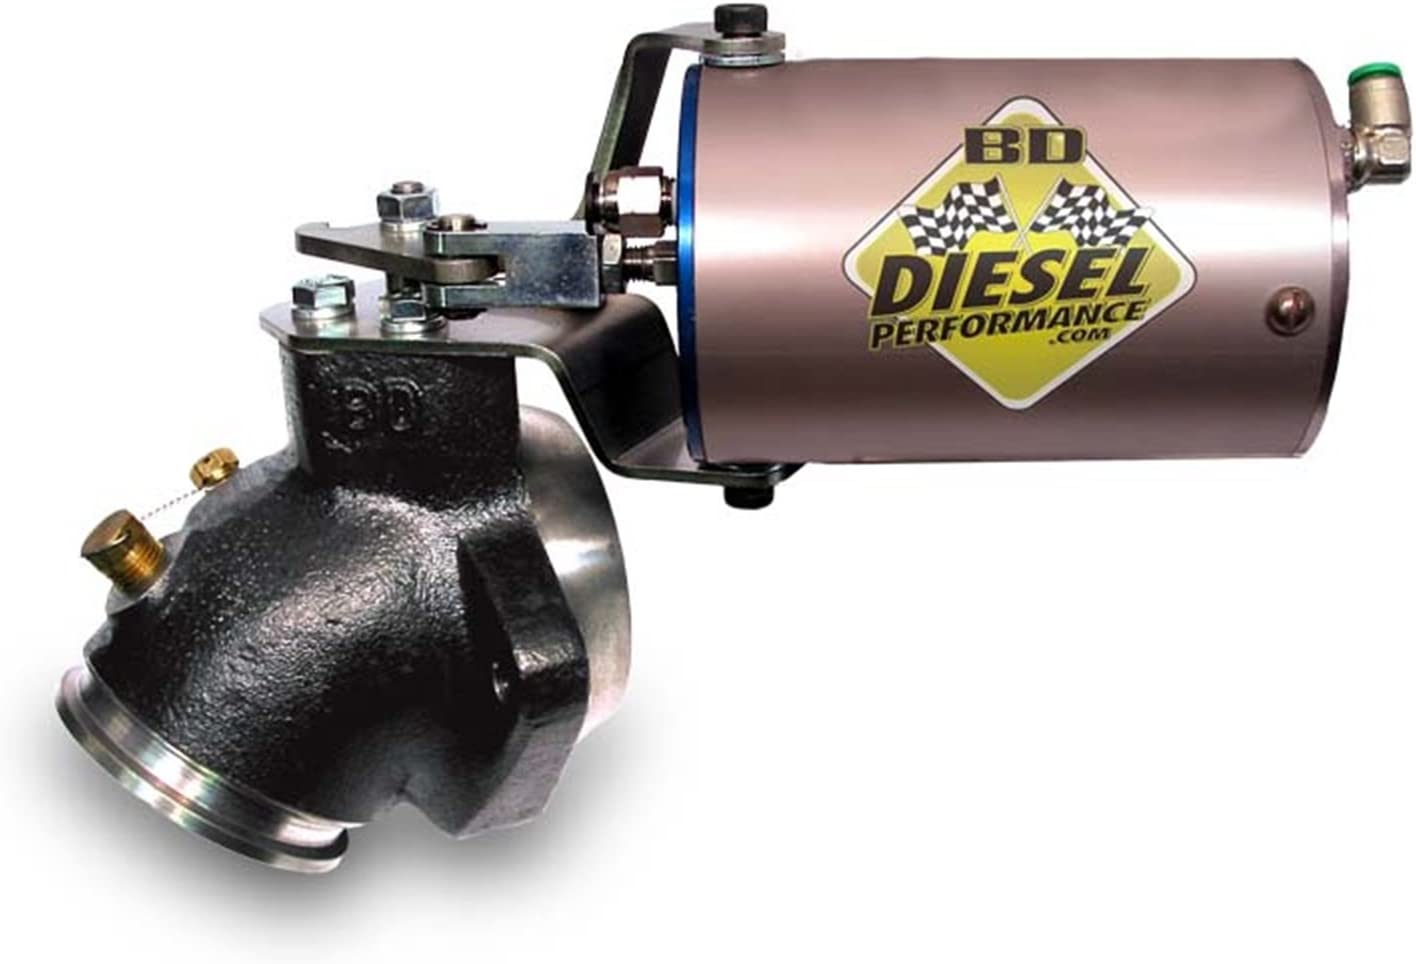 BD Diesel Performance 1300210 Exhaust Brake Switch